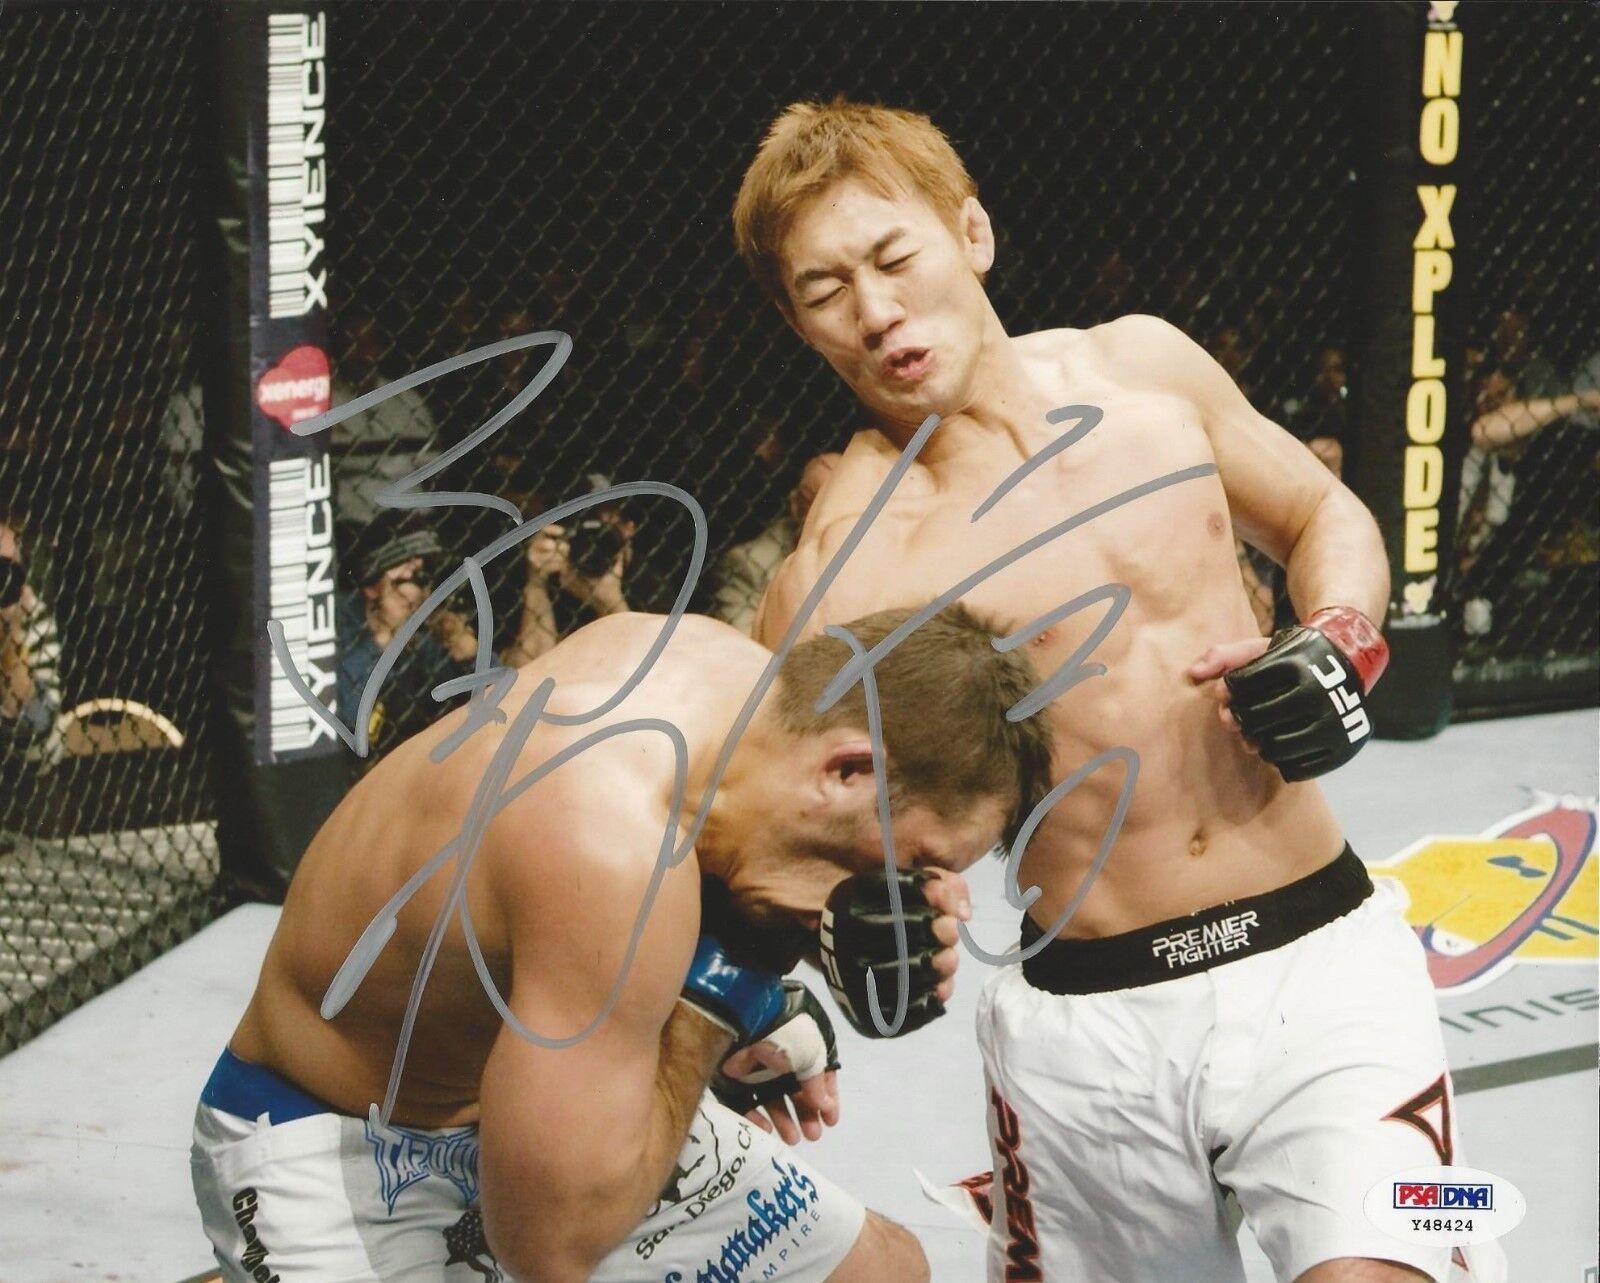 Yushin Okami UFC Fighter signed 8x10 photo PSA/DNA # Y48424